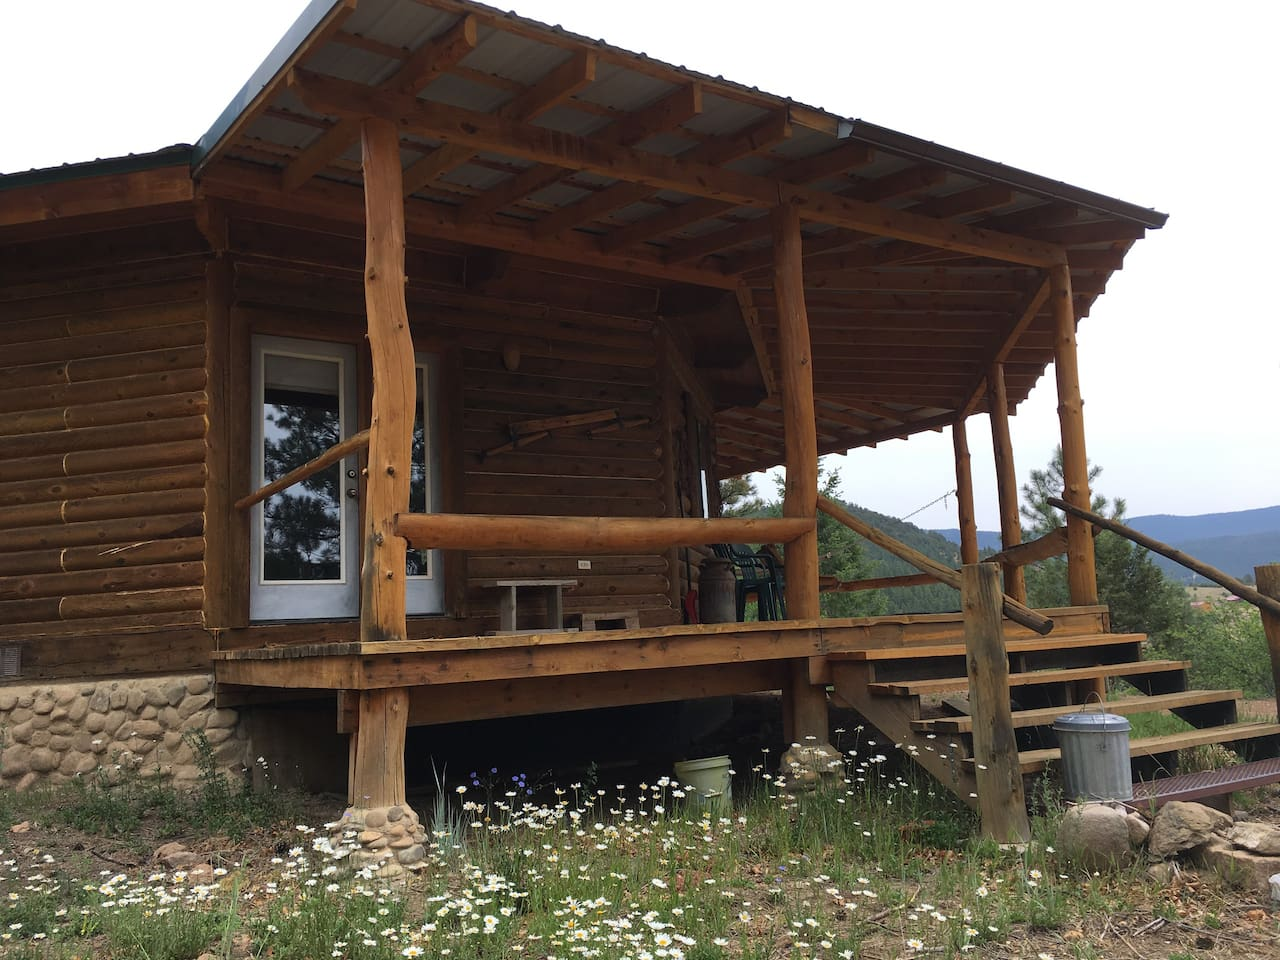 The Porch of the Hogan (Hogaan)